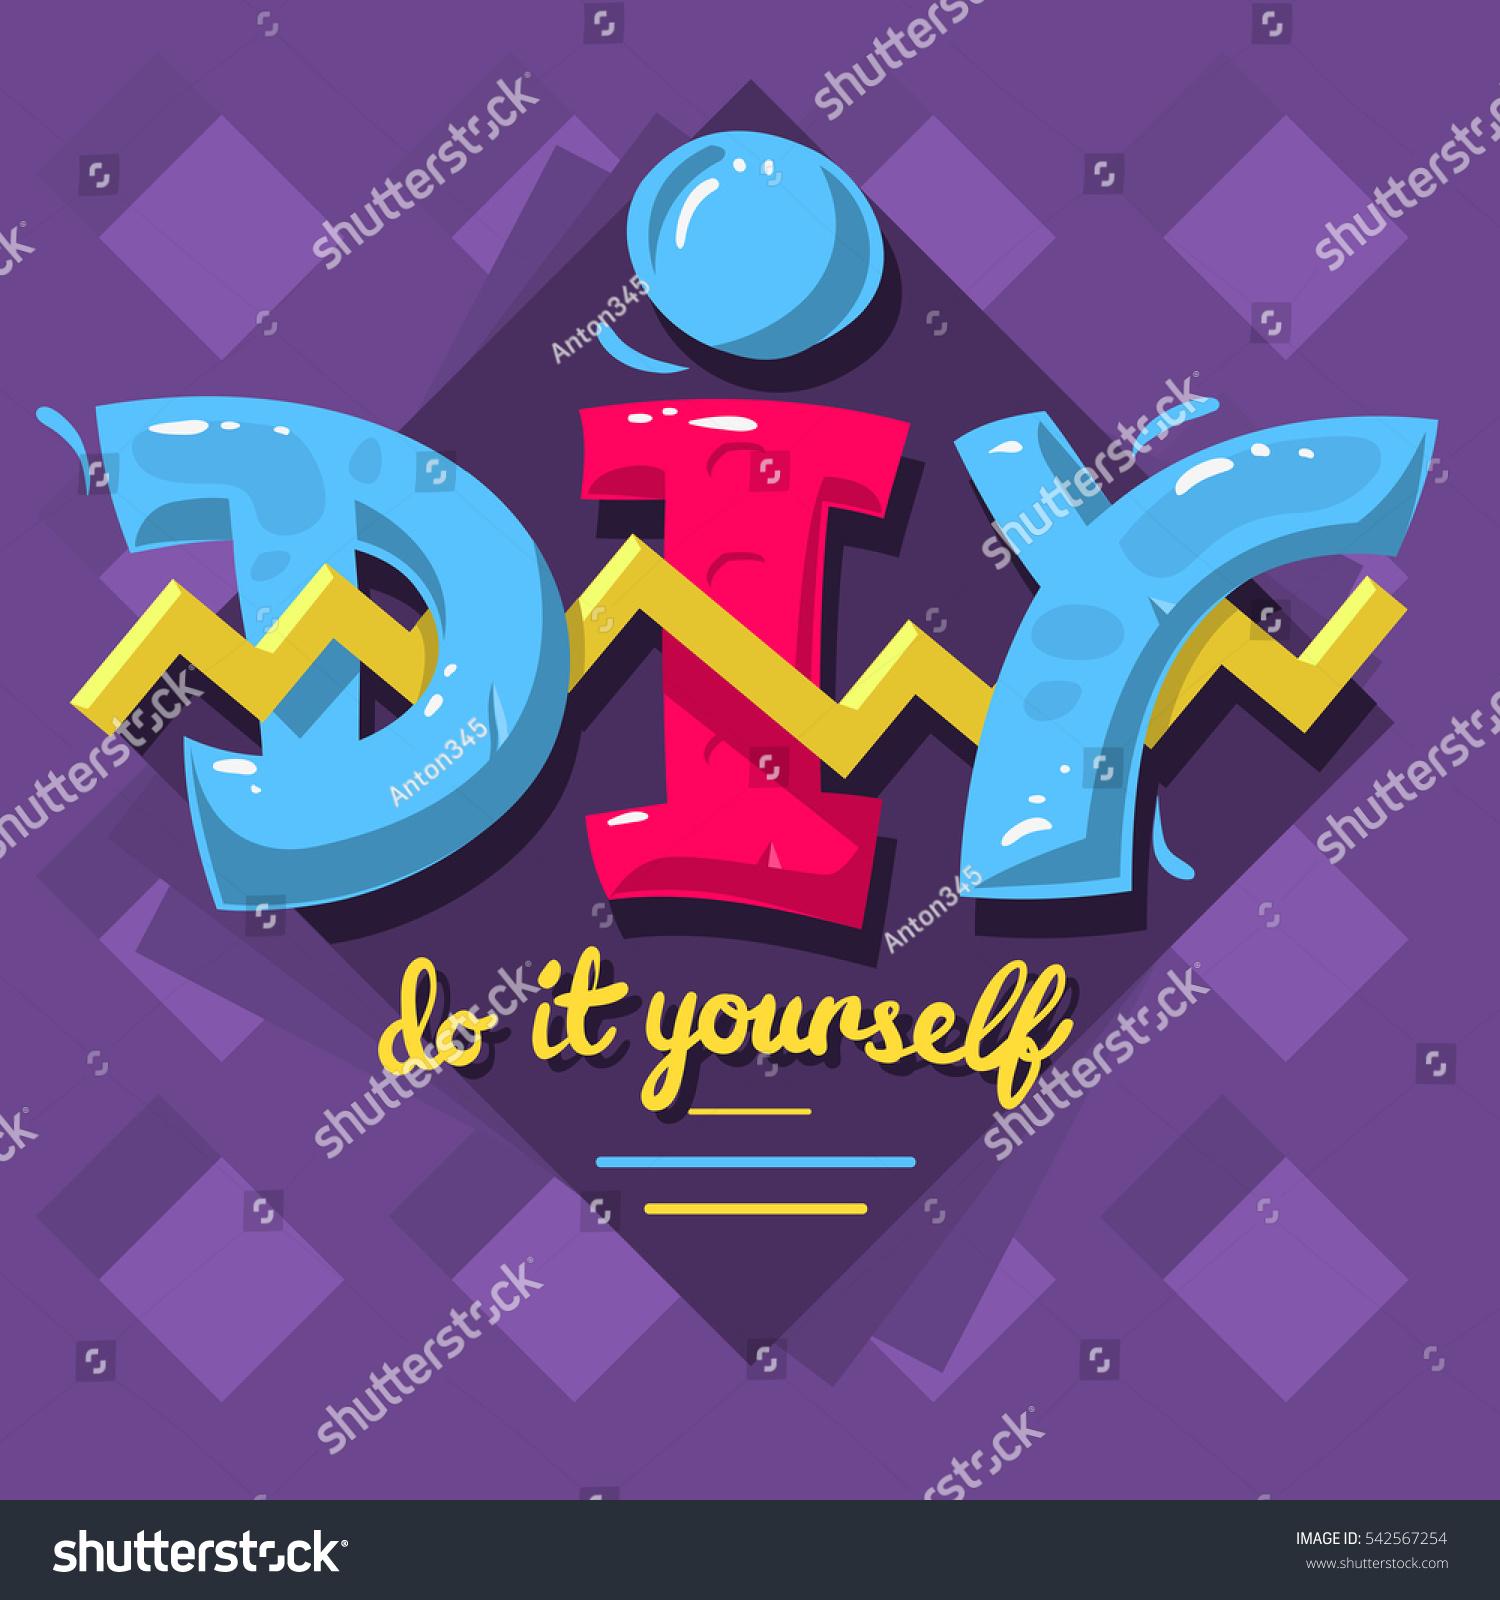 diy acronym do yourself 90s vibrant stock vector 542567254